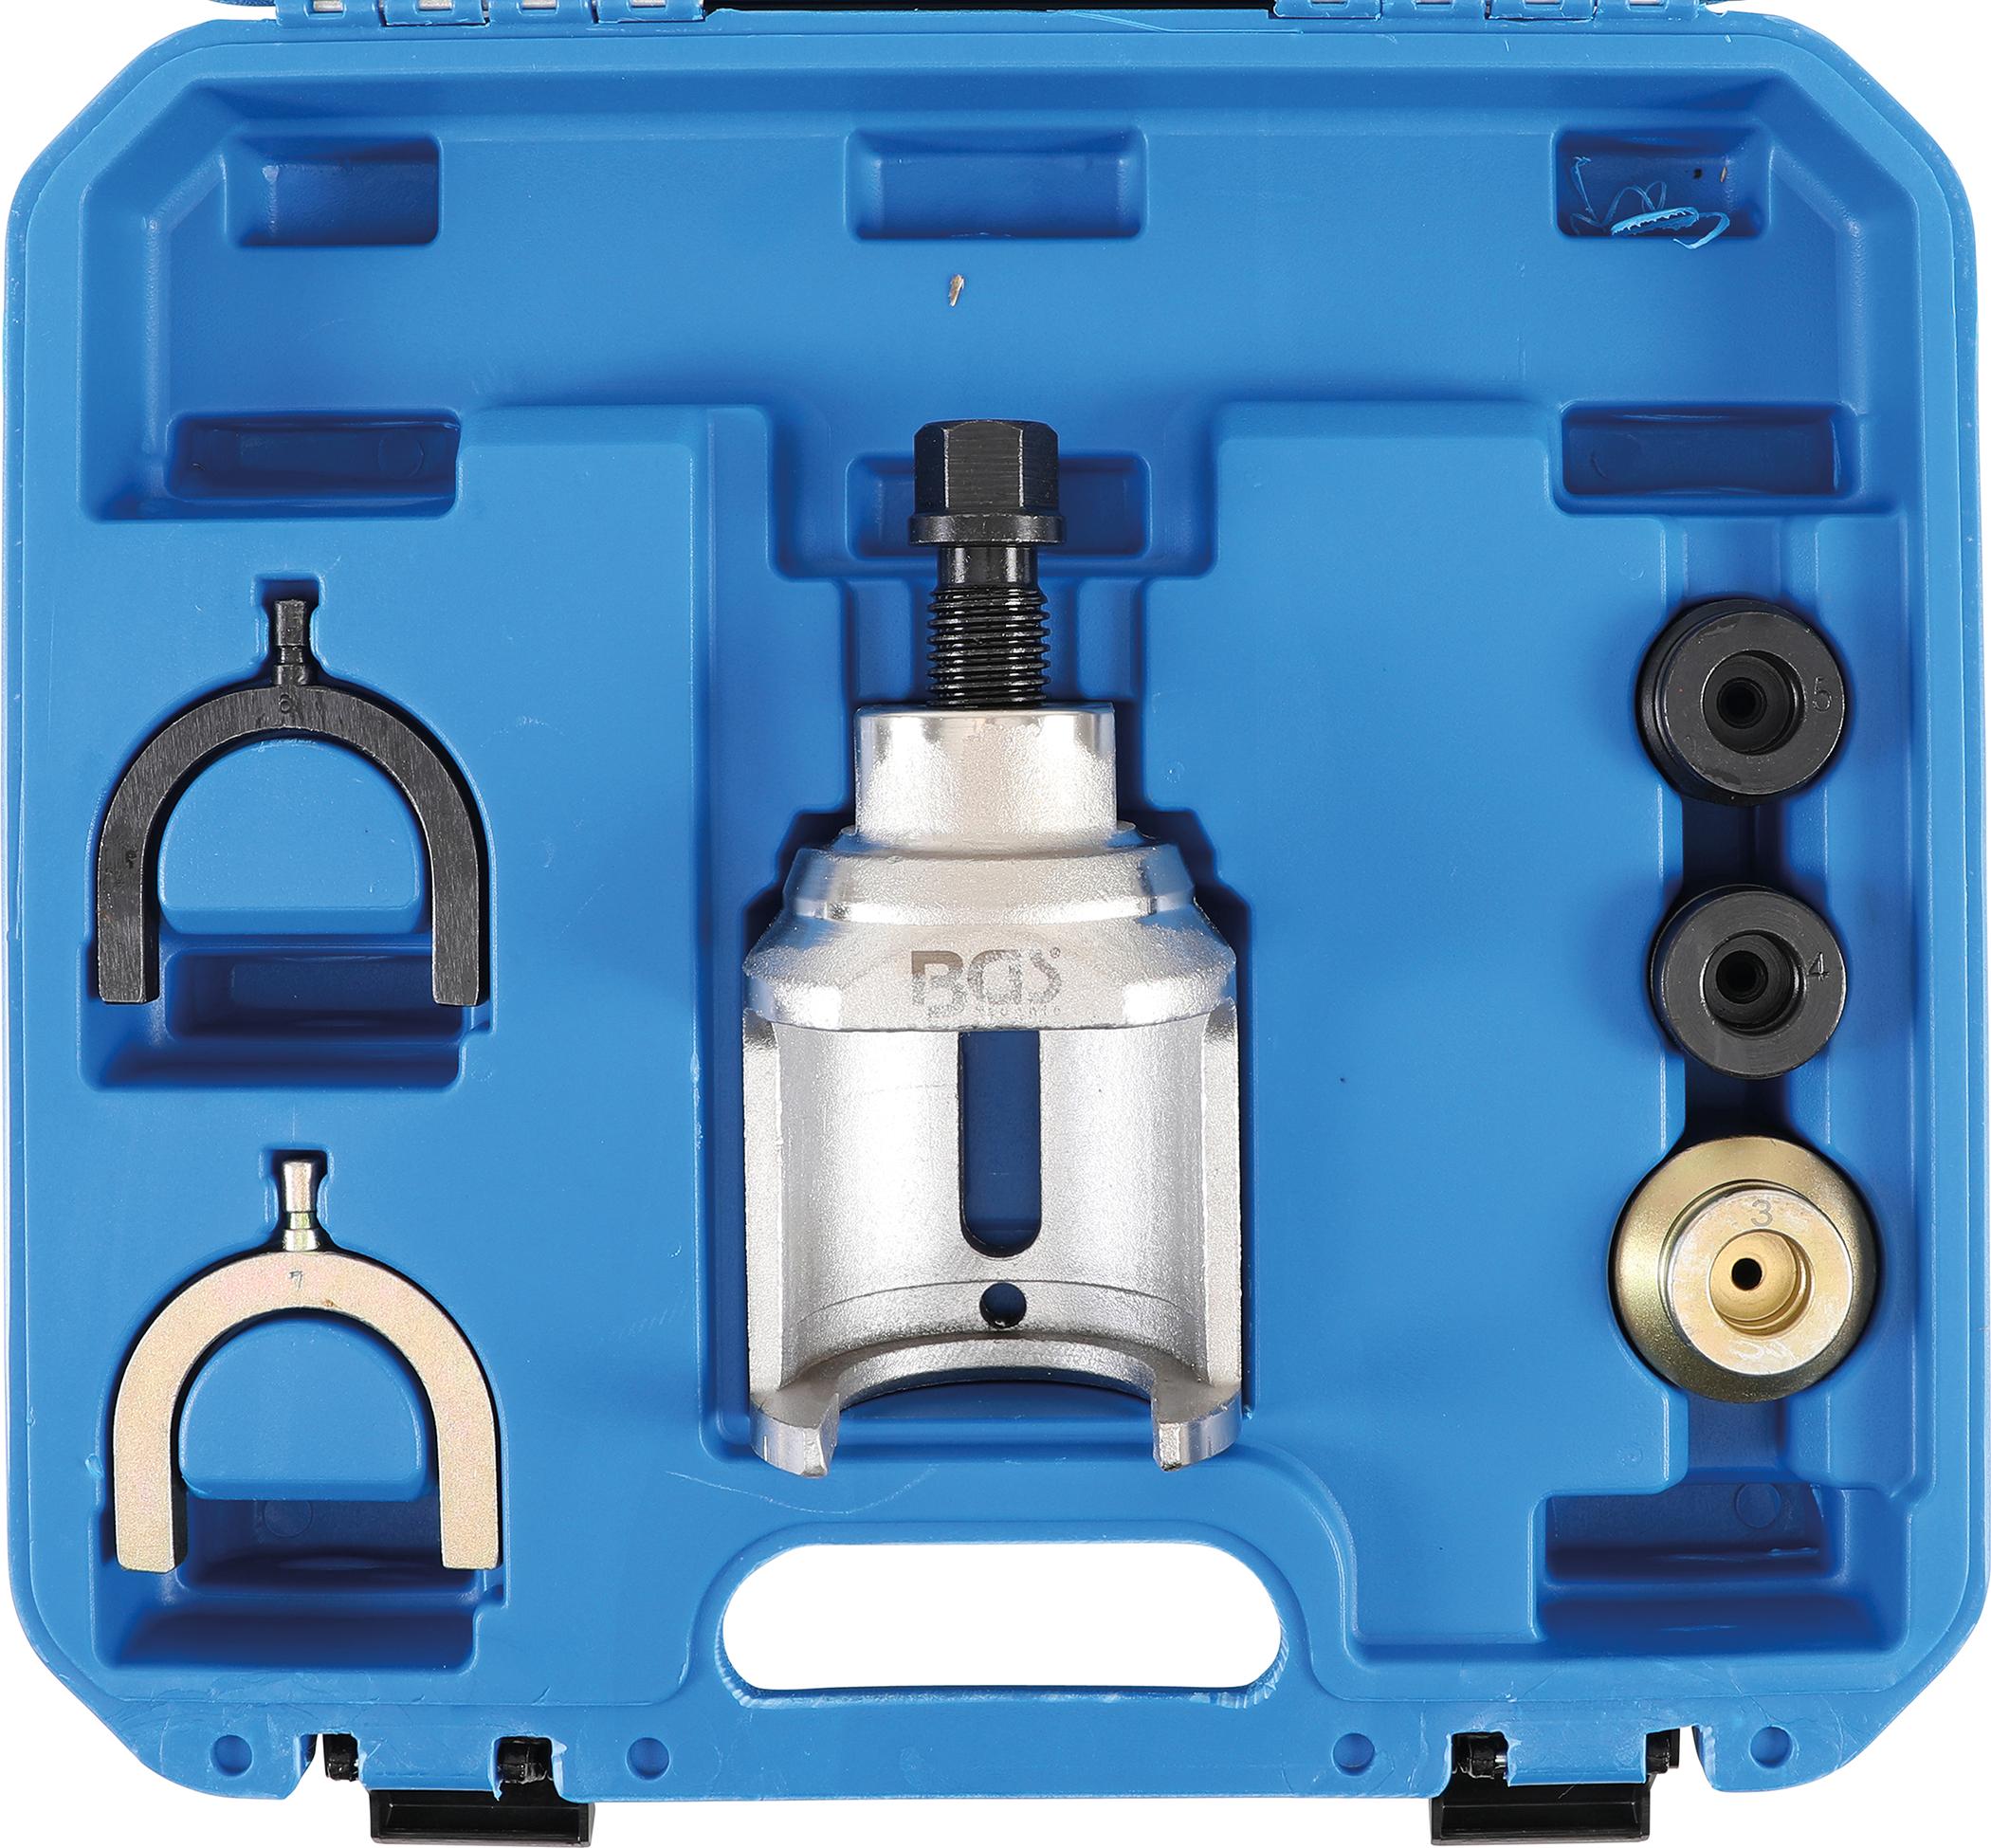 VW T4 Bus Traggelenk Auszieher Tool Abzieher Presse Einpress Werkzeug Presse